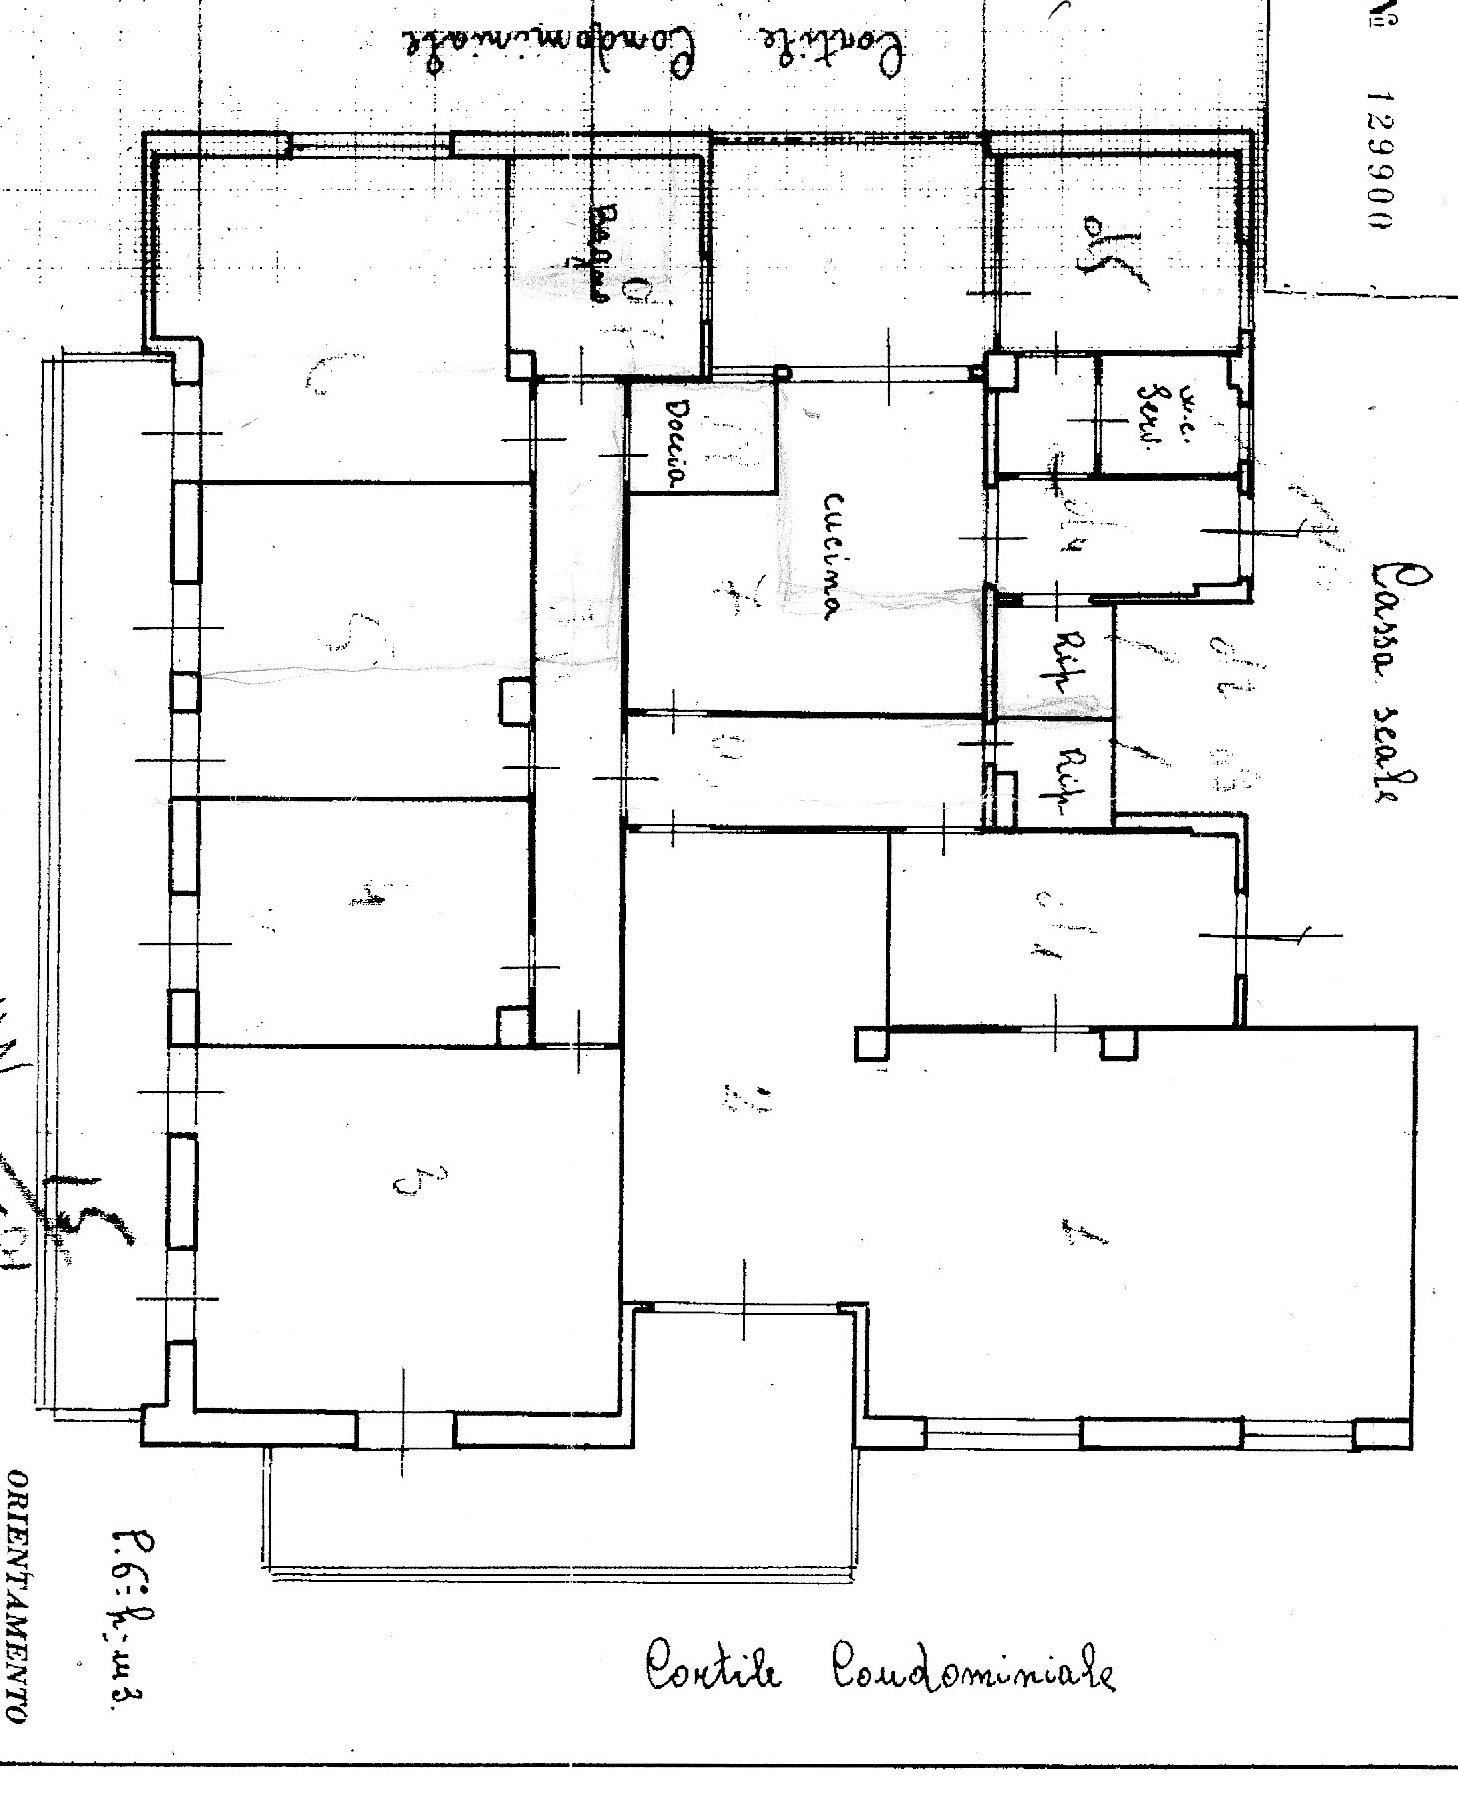 Planimetria L.Giordano 1.380